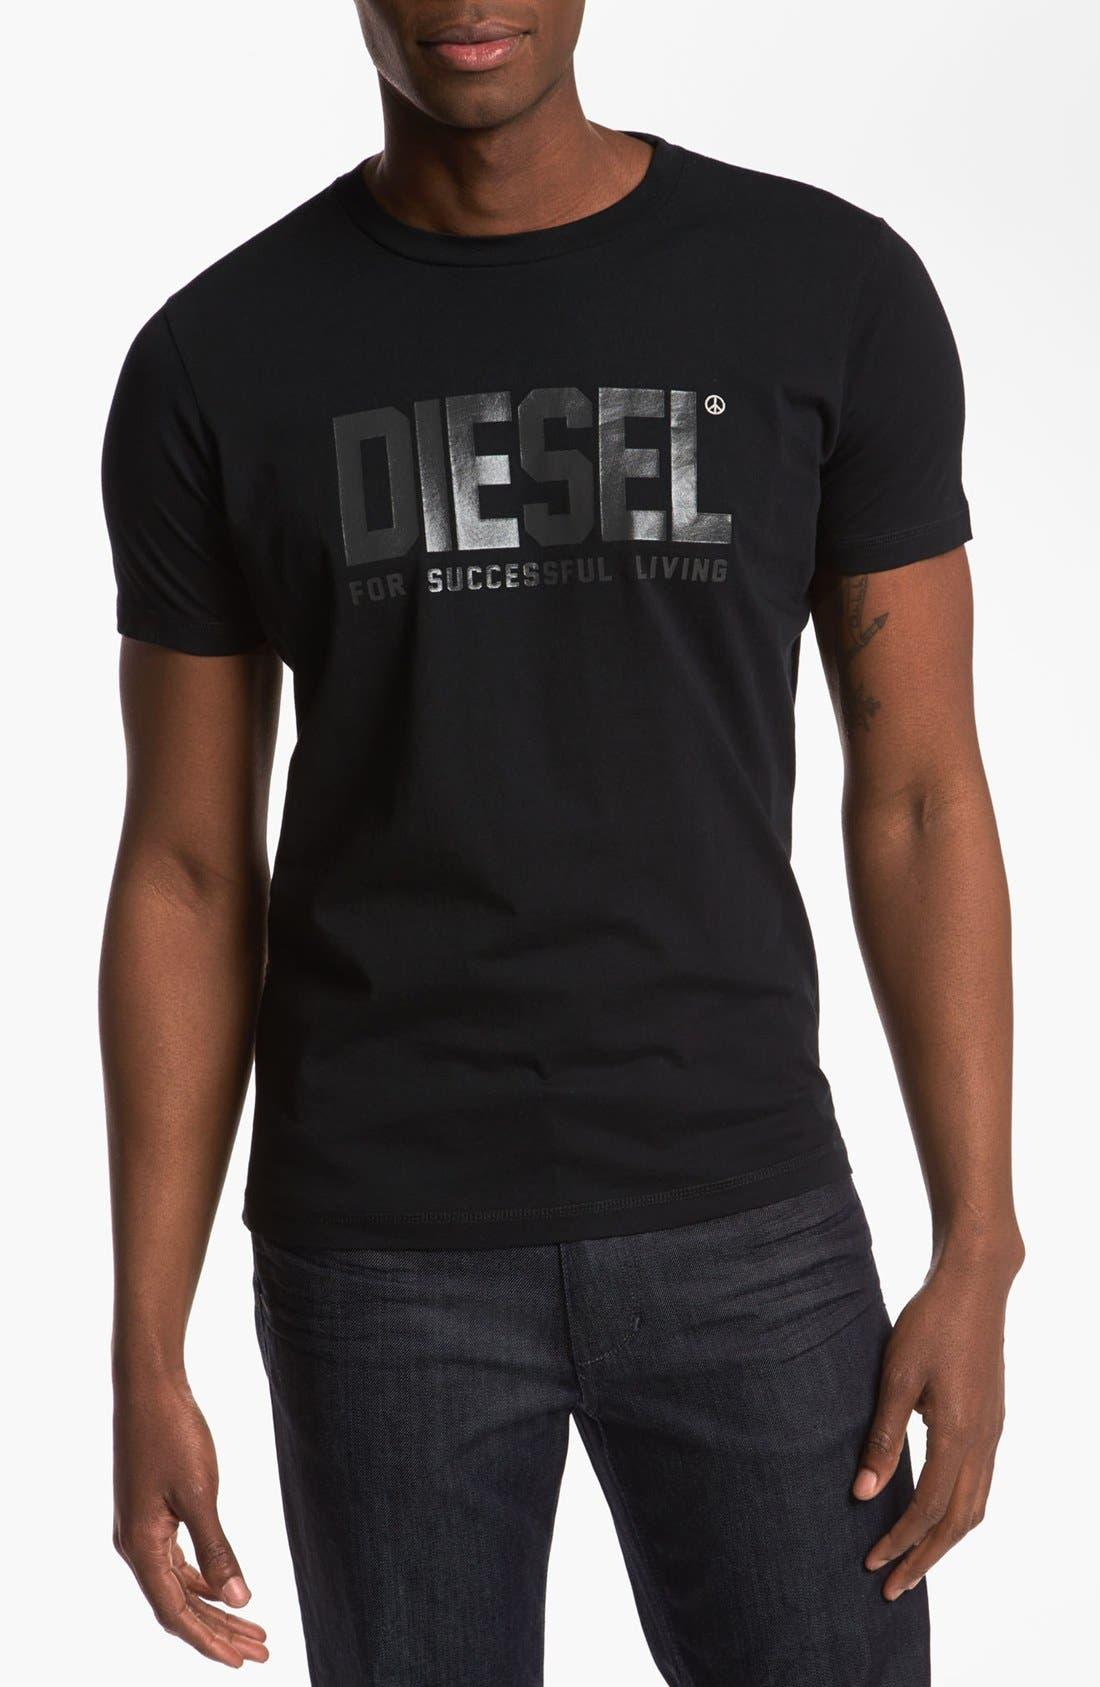 Main Image - DIESEL® 'T-Life' T-Shirt